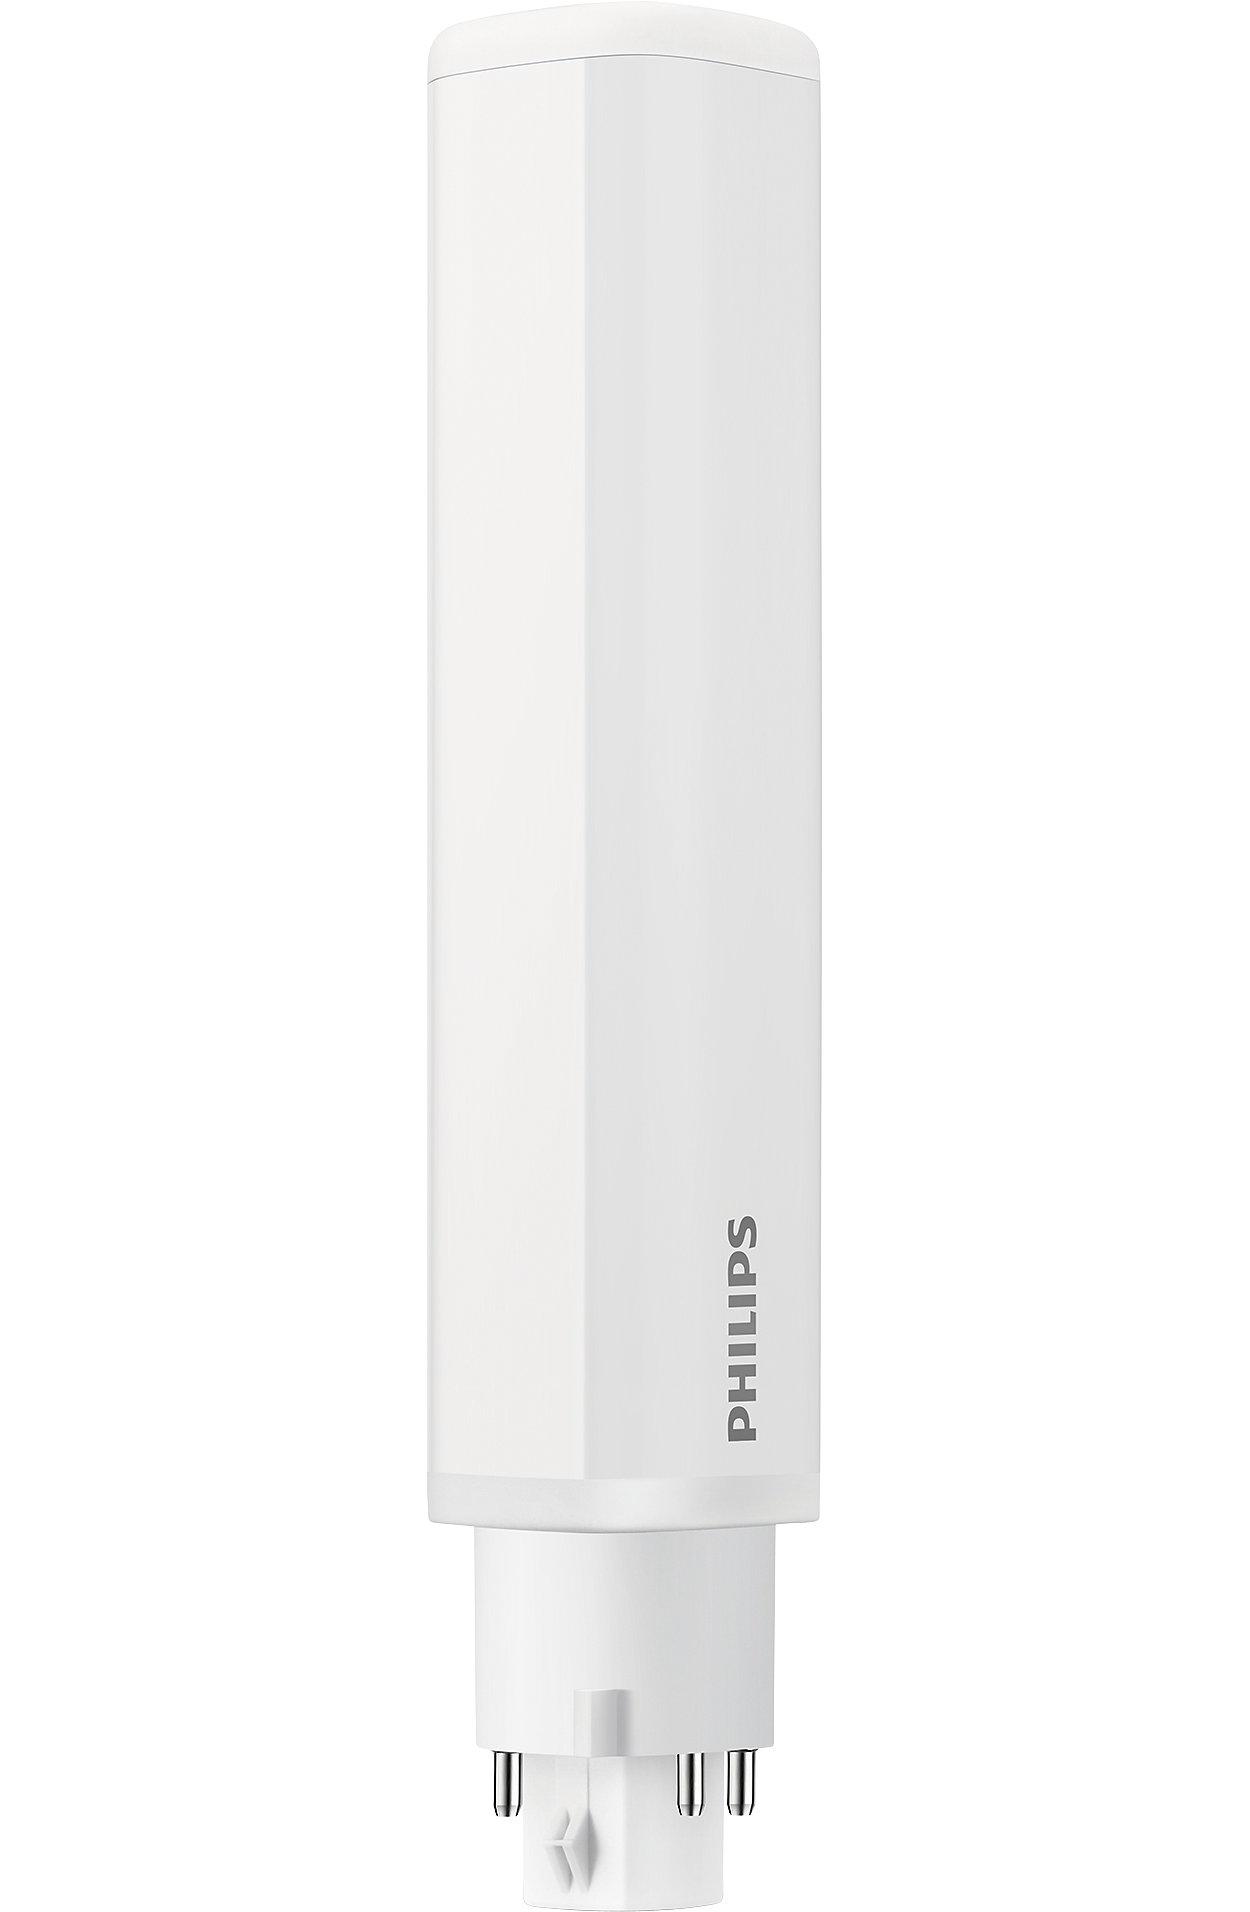 Noua generaţie de tuburi de iluminat LED PLC cu consum redus de energie